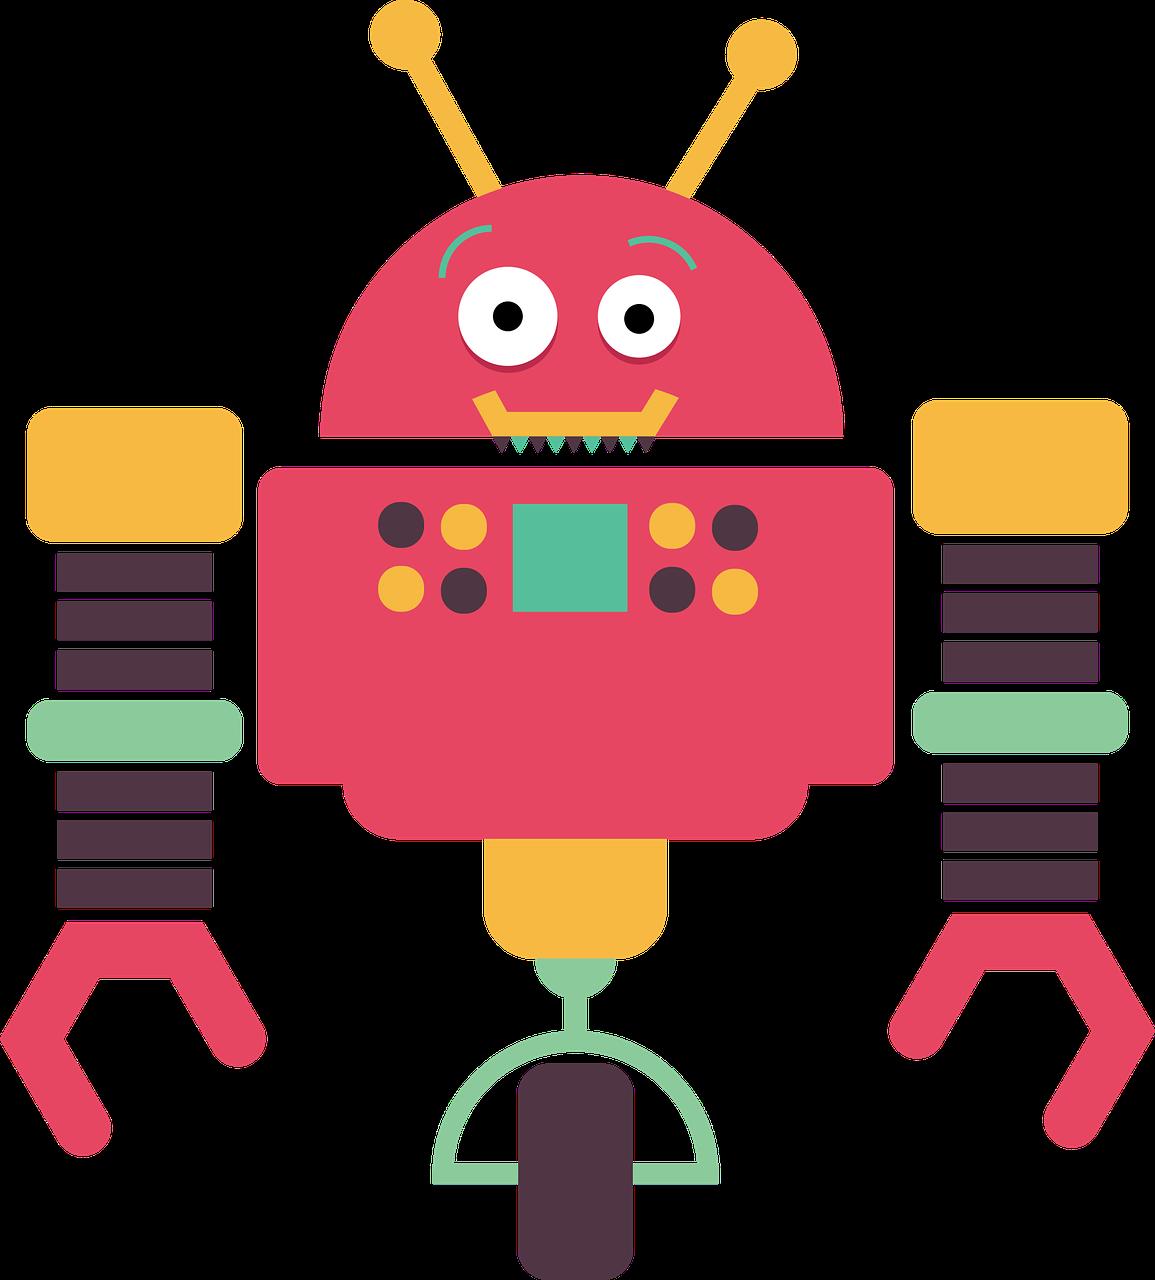 Free Image On Pixabay Robot Robotics Technology Creative Thinking Skills Life Skills Chatbot